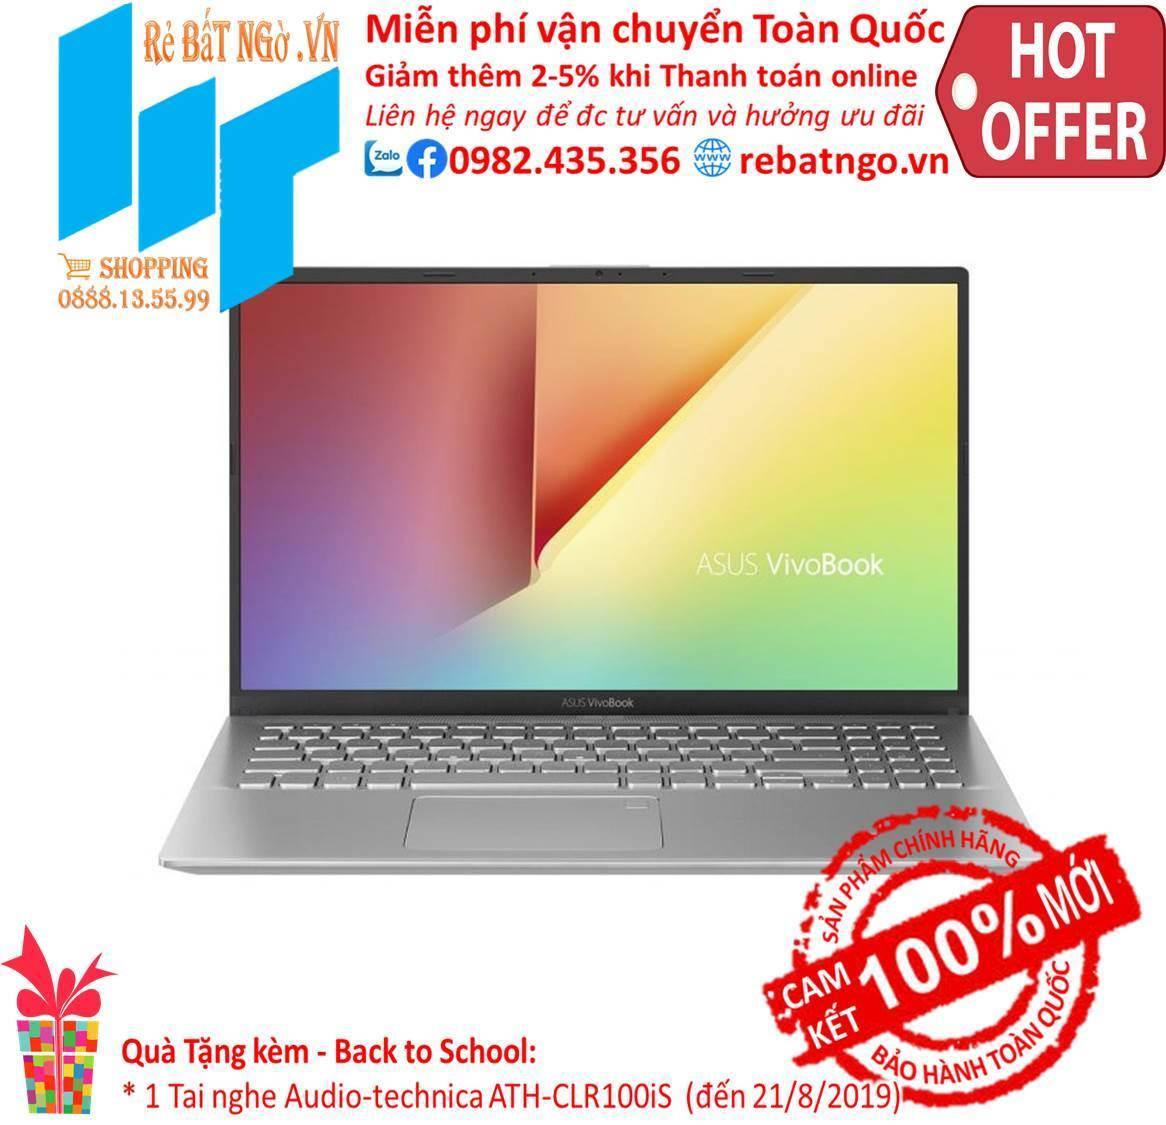 Laptop ASUS VivoBook 15 A512FA-EJ117T 15.6 inch FHD_i3-8145U_4GB_1TB HDD_UHD 620_Win10_1.7 kg